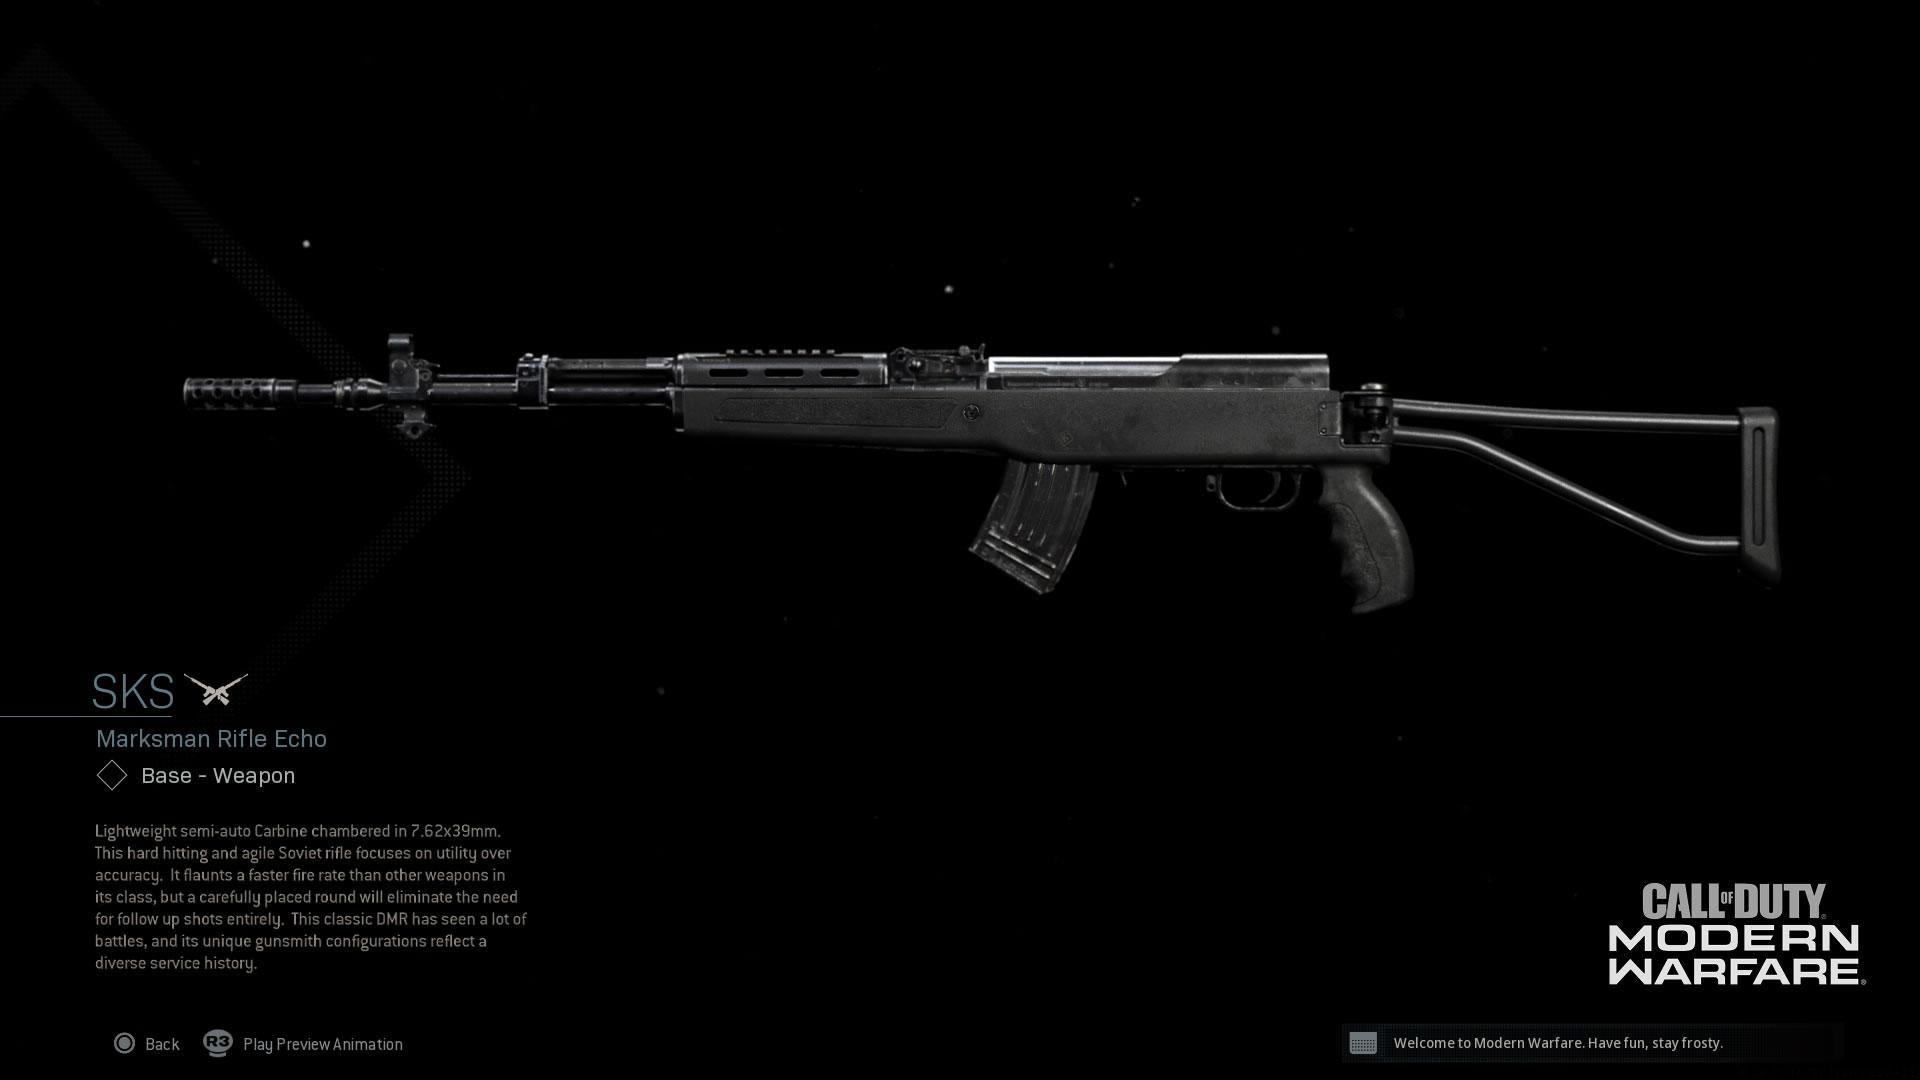 Modern Warfare® Weapon Detail: SKS - Image 6